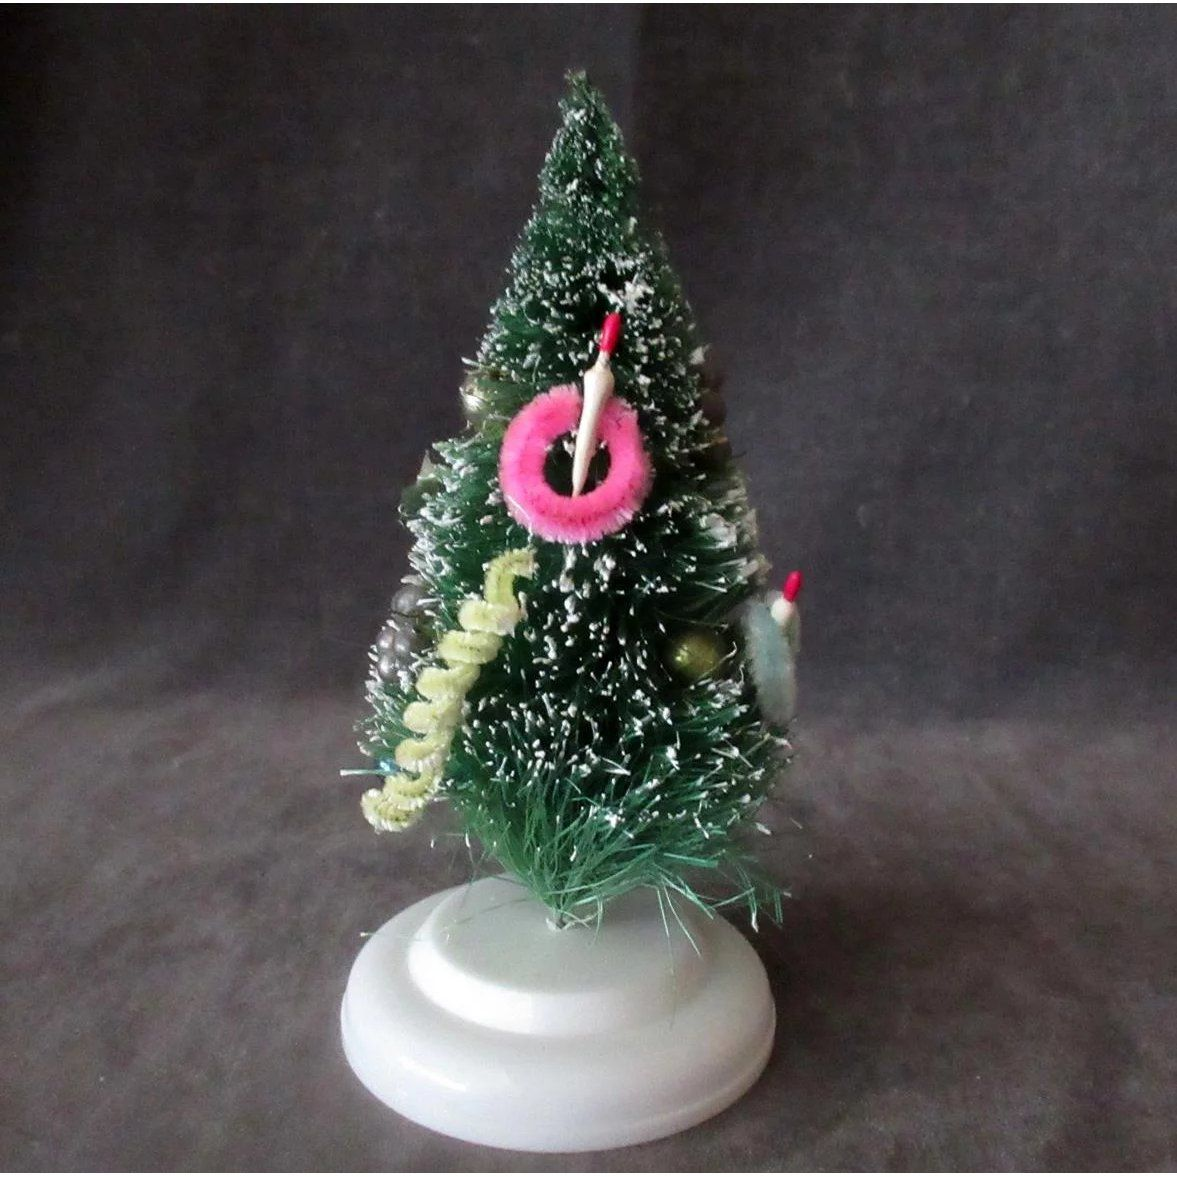 Vintage 6 Bottle Brush Christmas Tree With Ornaments Flocked Tips Bottle Brush Christmas Trees Christmas Tree Ornaments Christmas Bulbs